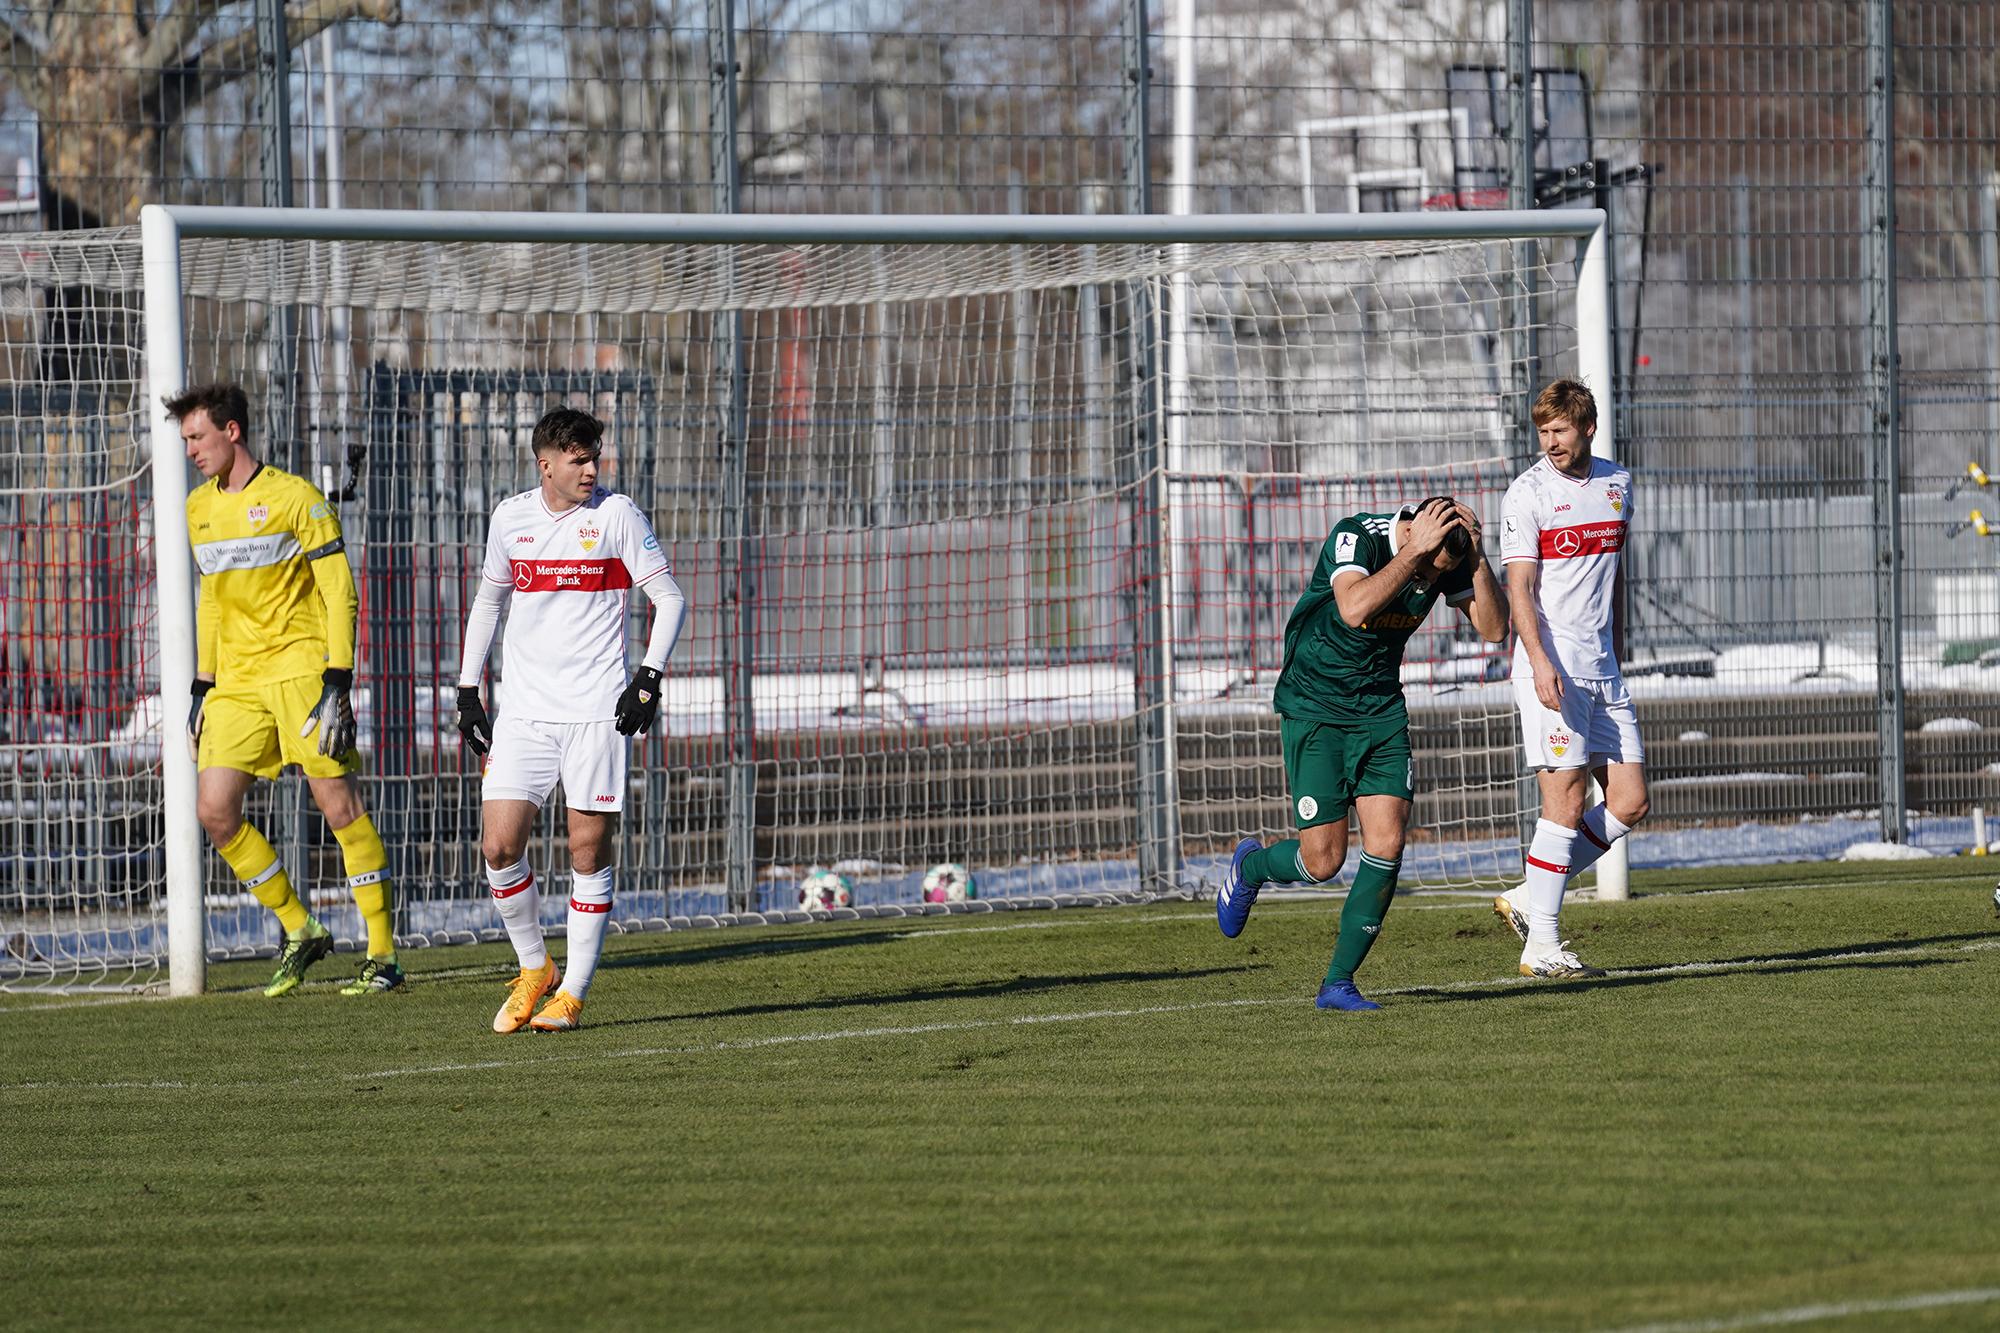 14.02.2021   Saison 2020/21   FC 08 Homburg   VfB Stuttgart II